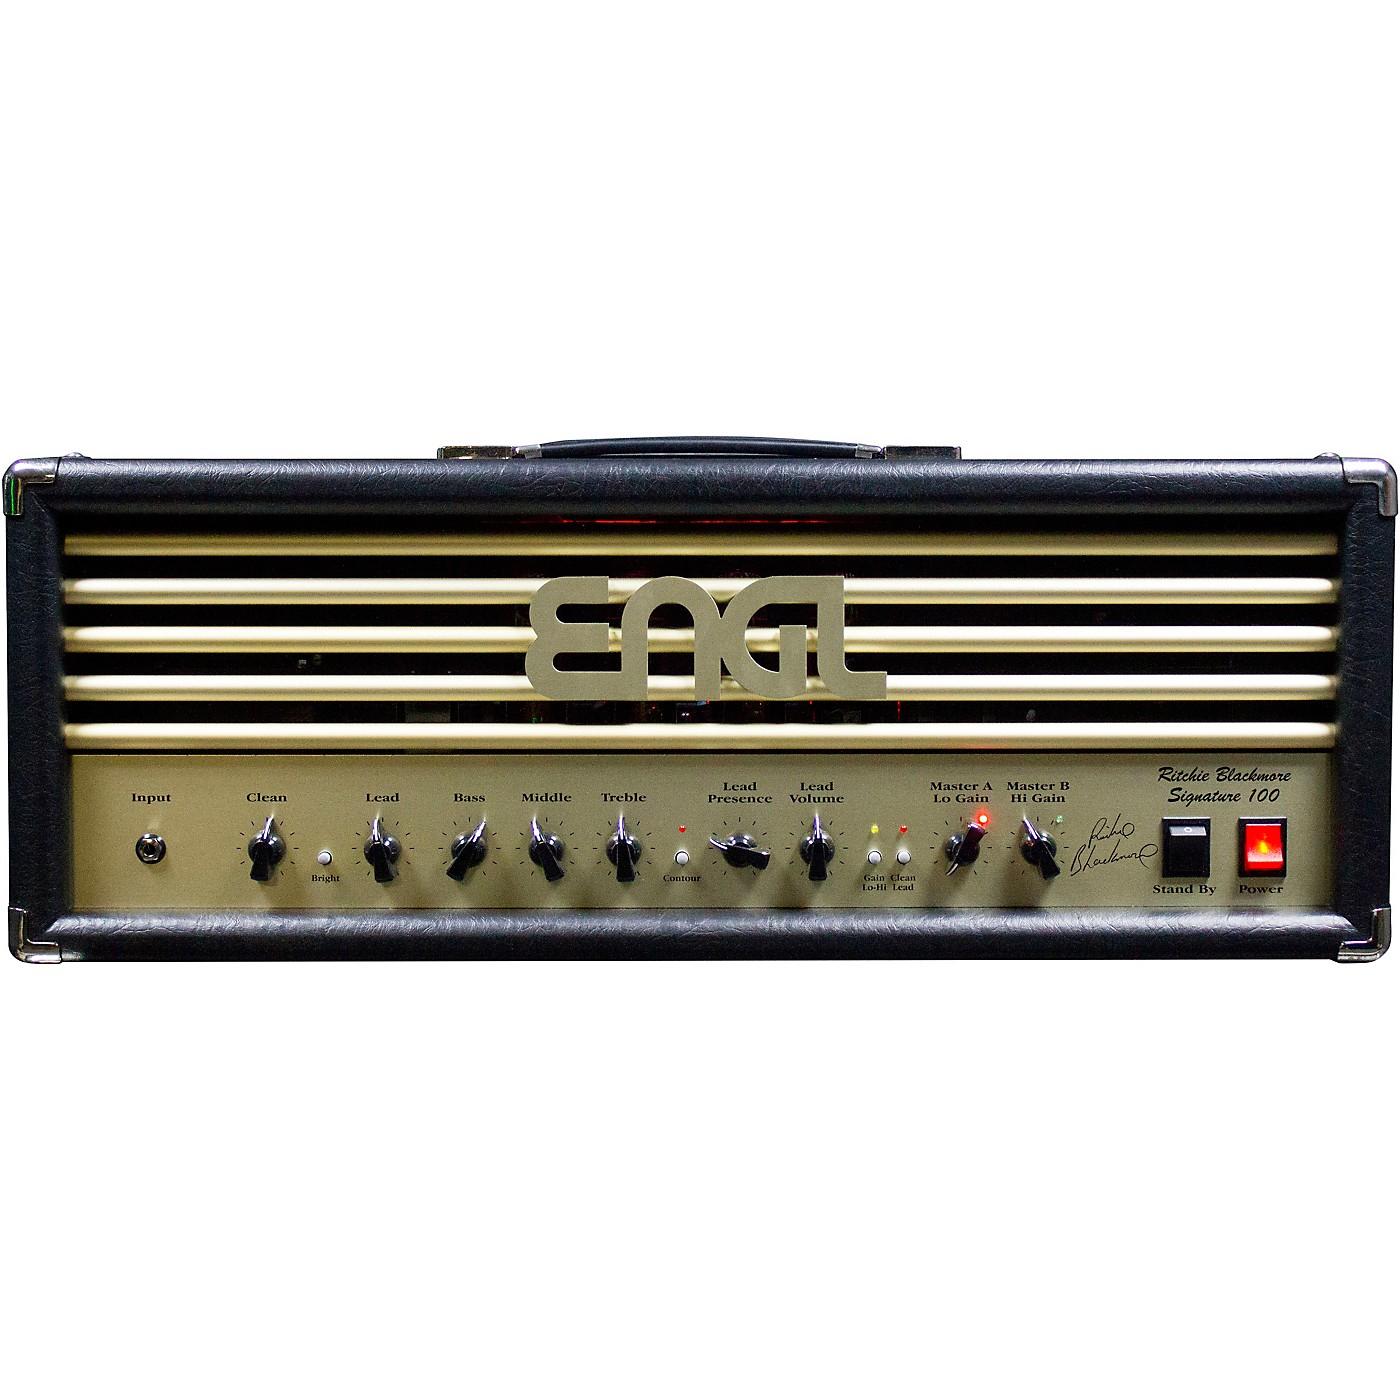 Engl E650 V2 Ritchie Blackmore Signature Tube Guitar Amp Head thumbnail